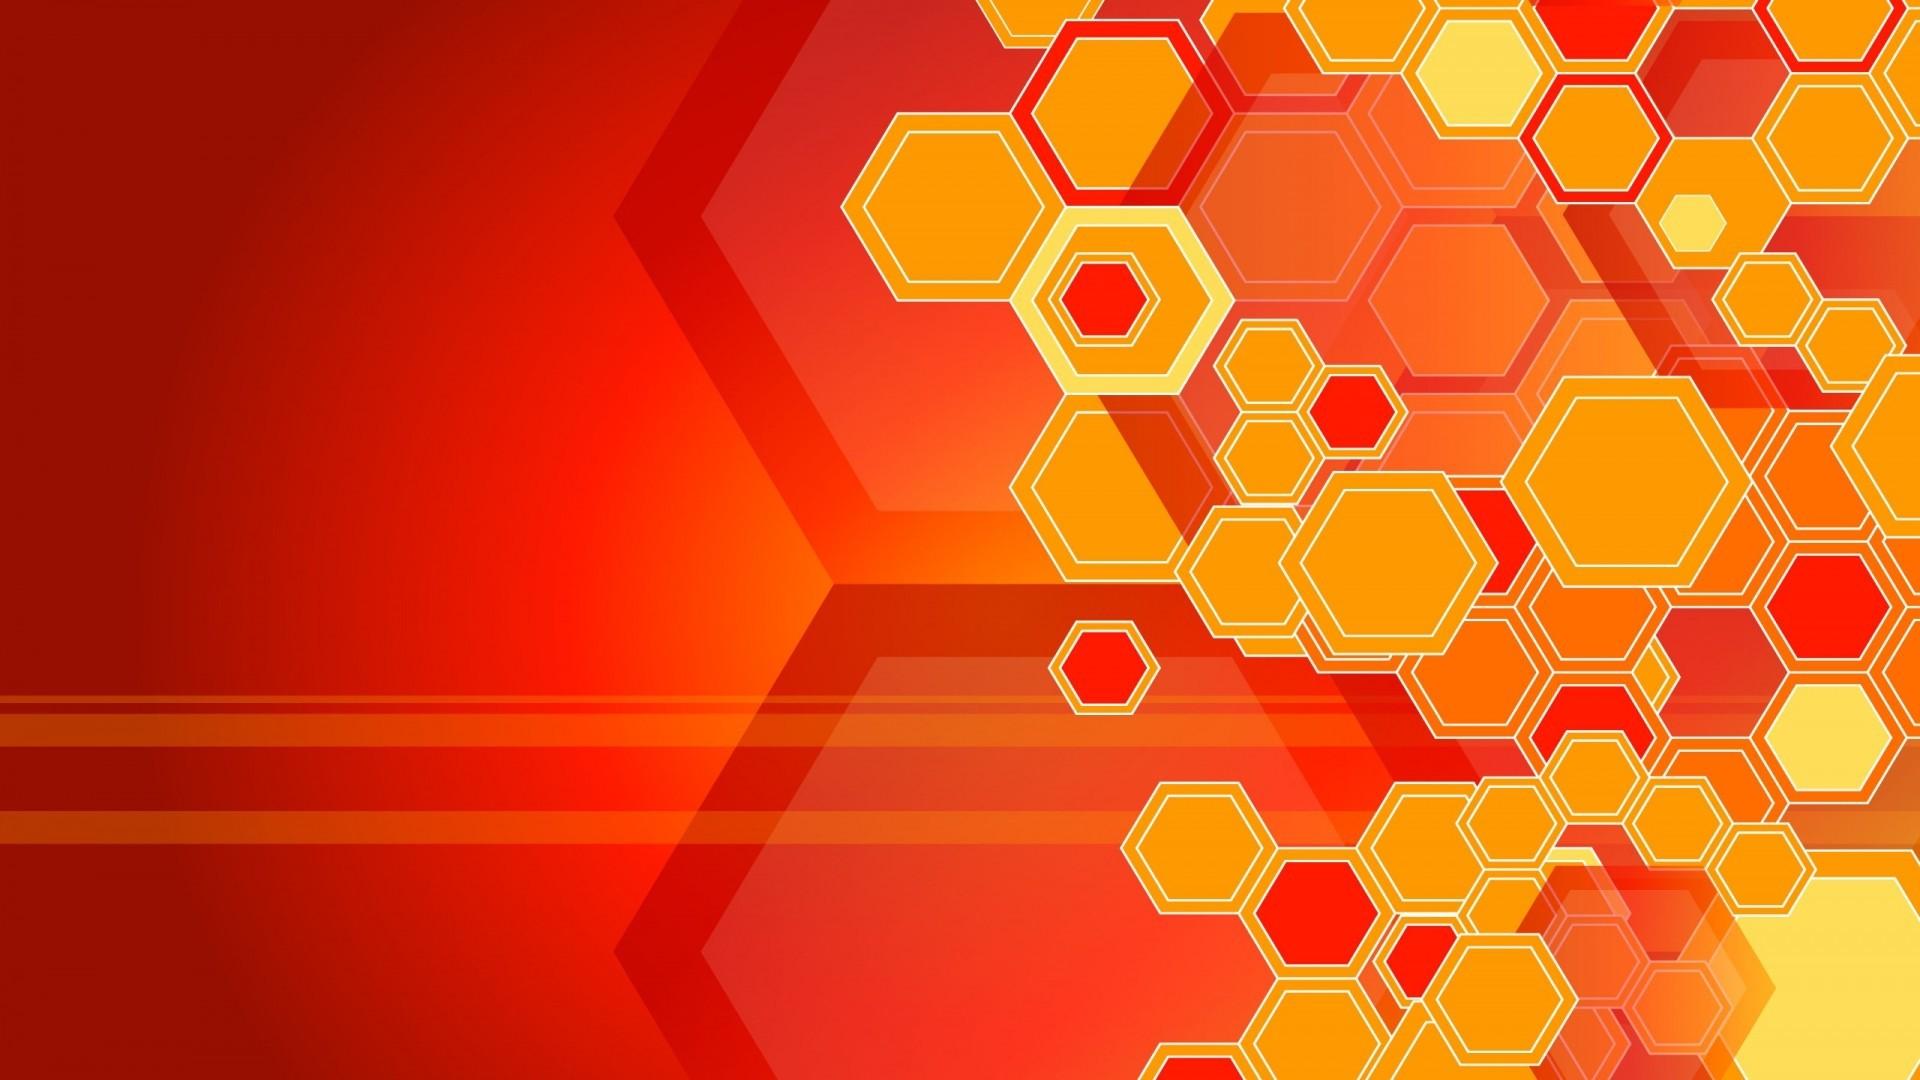 50 Music Wallpaper For Ipad On Wallpapersafari: [50+] Honeycomb Wallpaper On WallpaperSafari